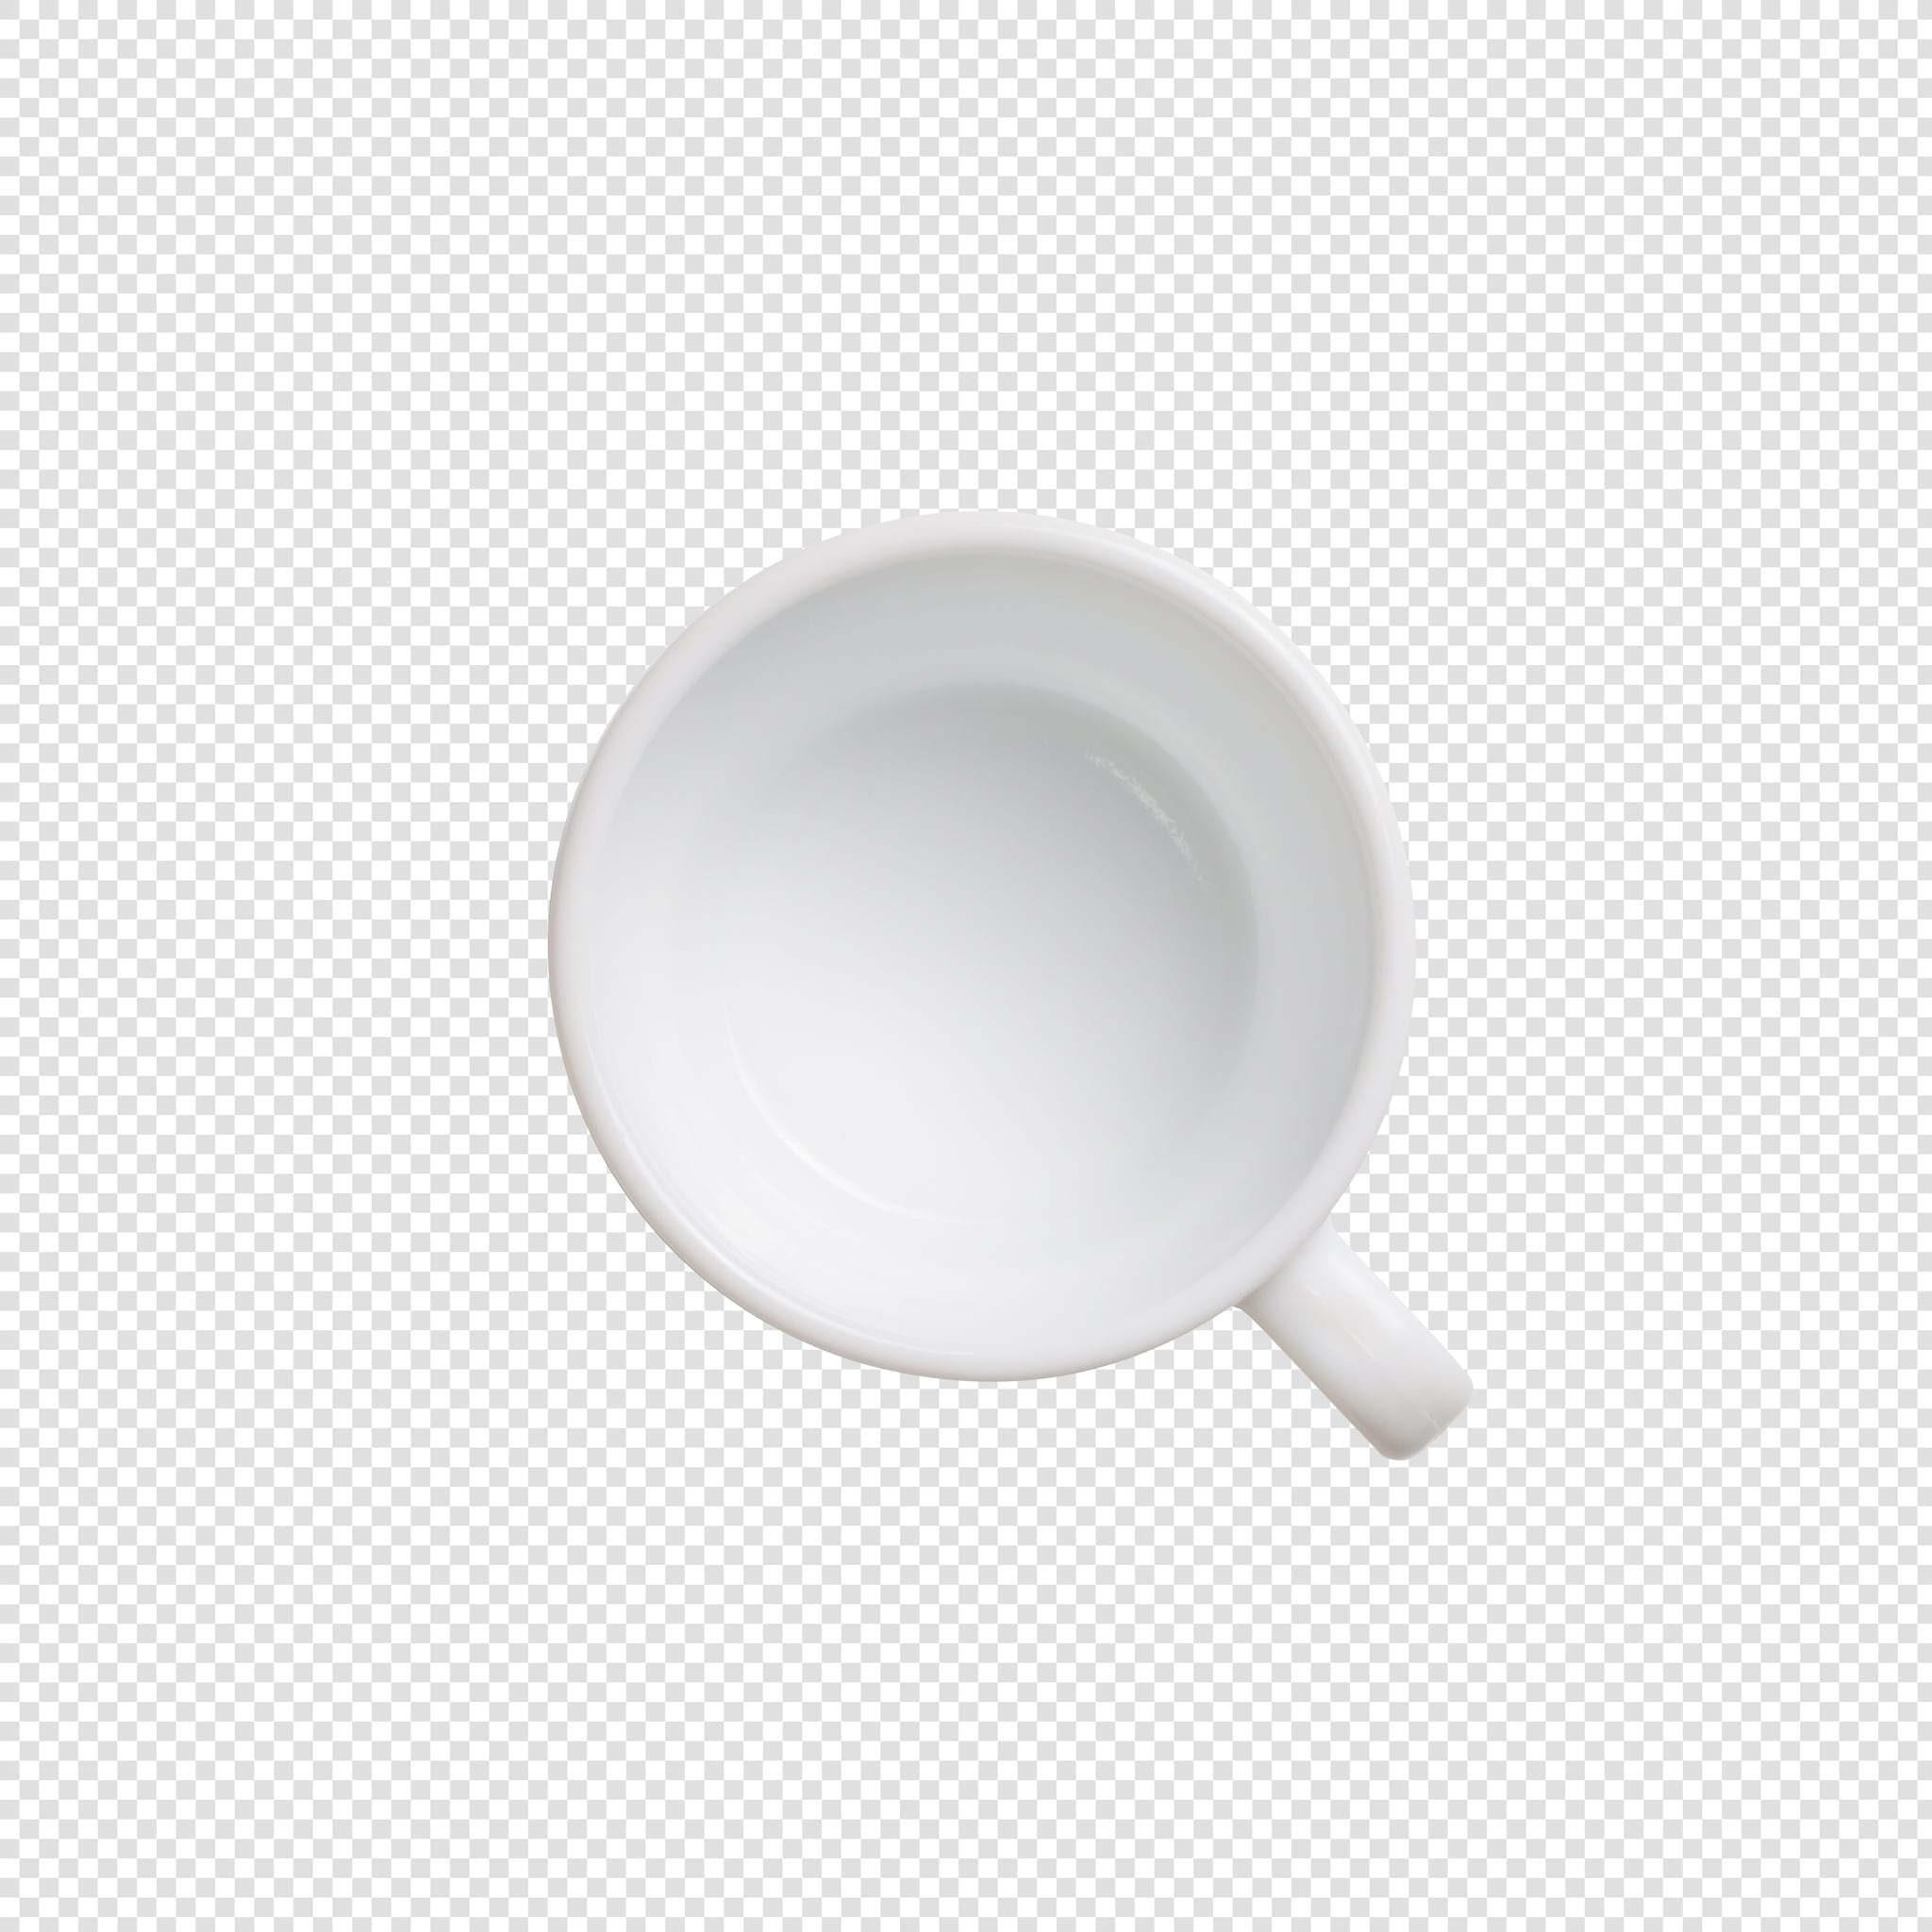 Mug PSD image with transparent background